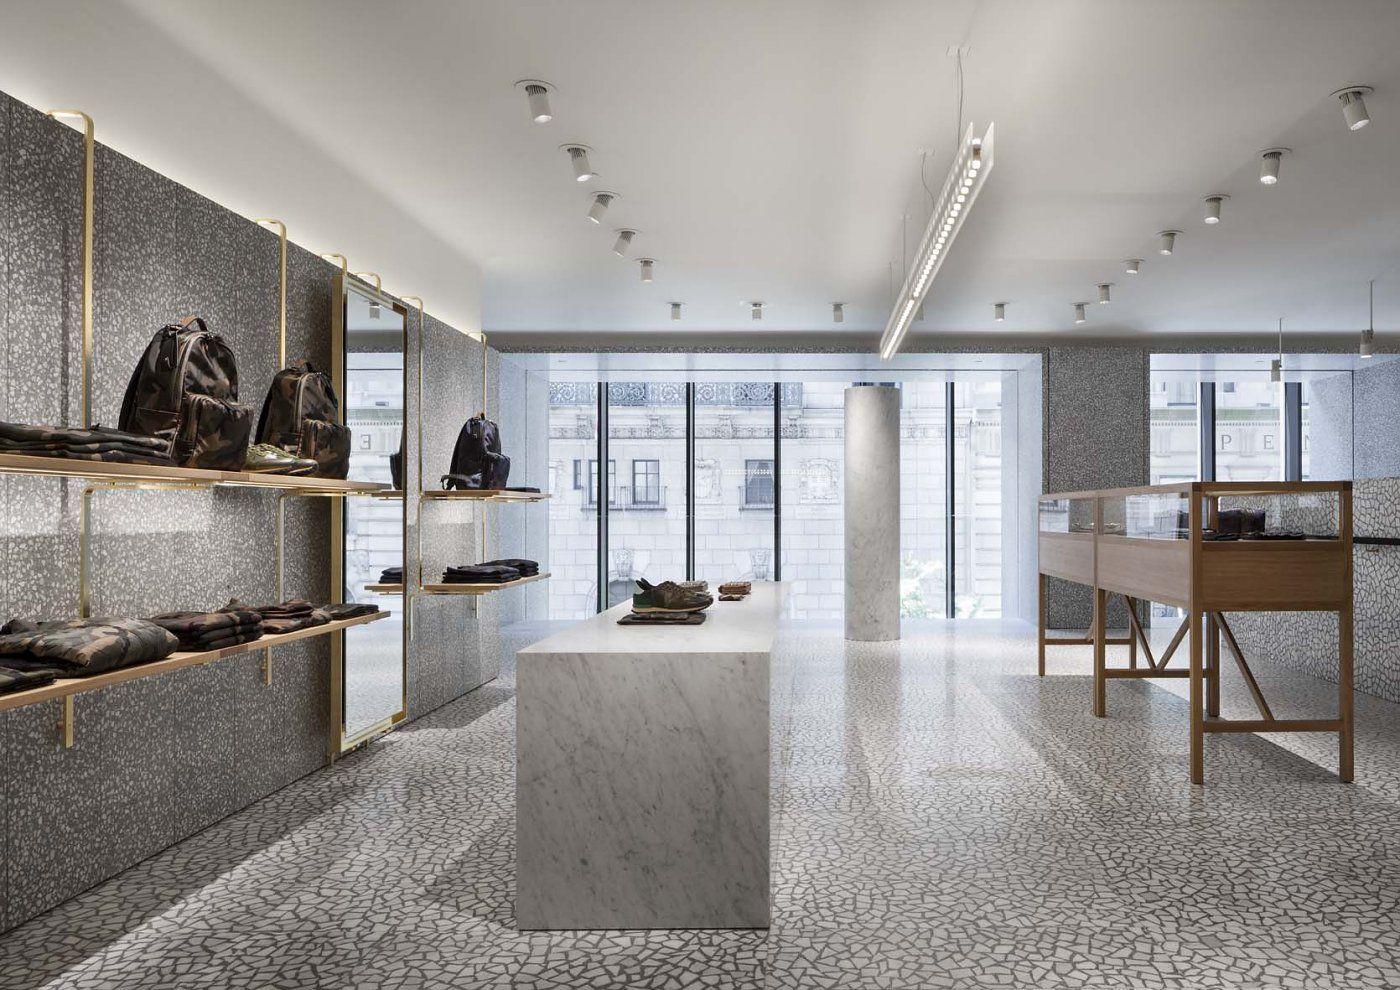 ad56eaa52a2b5 Valentino New York Opened | Store | Retail design, Valentino store ...